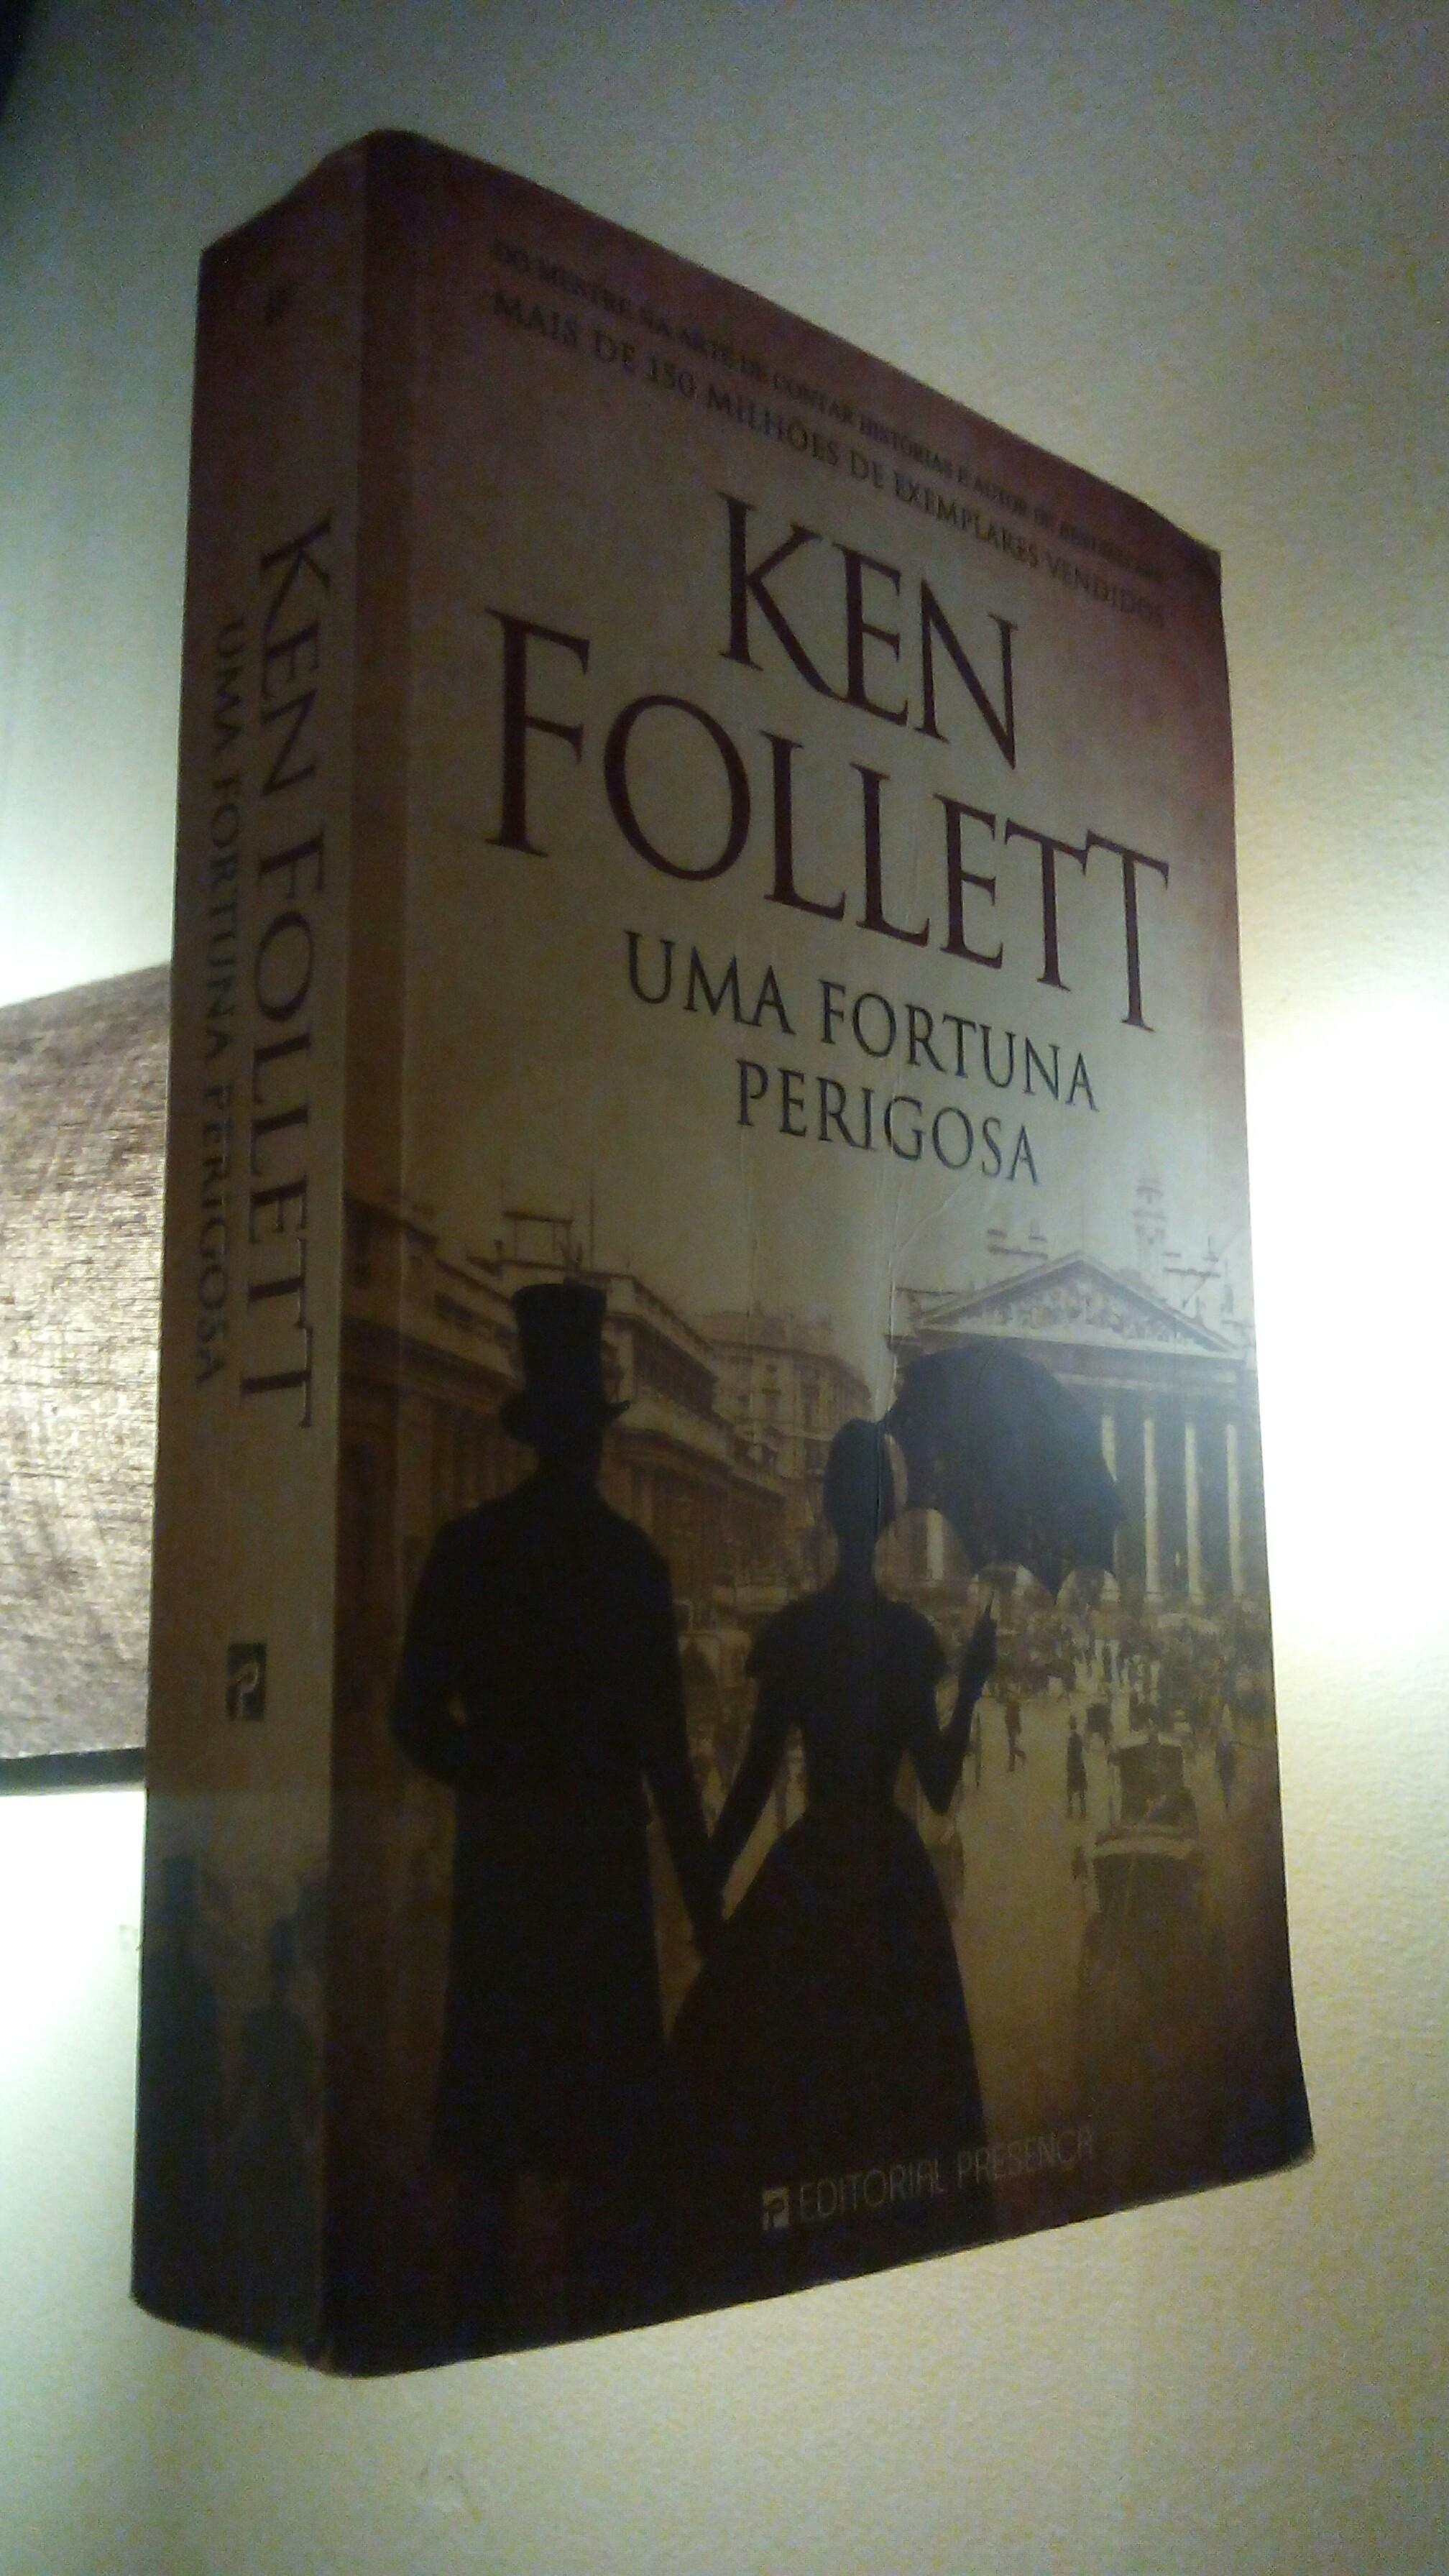 Ken Follett – Uma Fortuna Perigosa